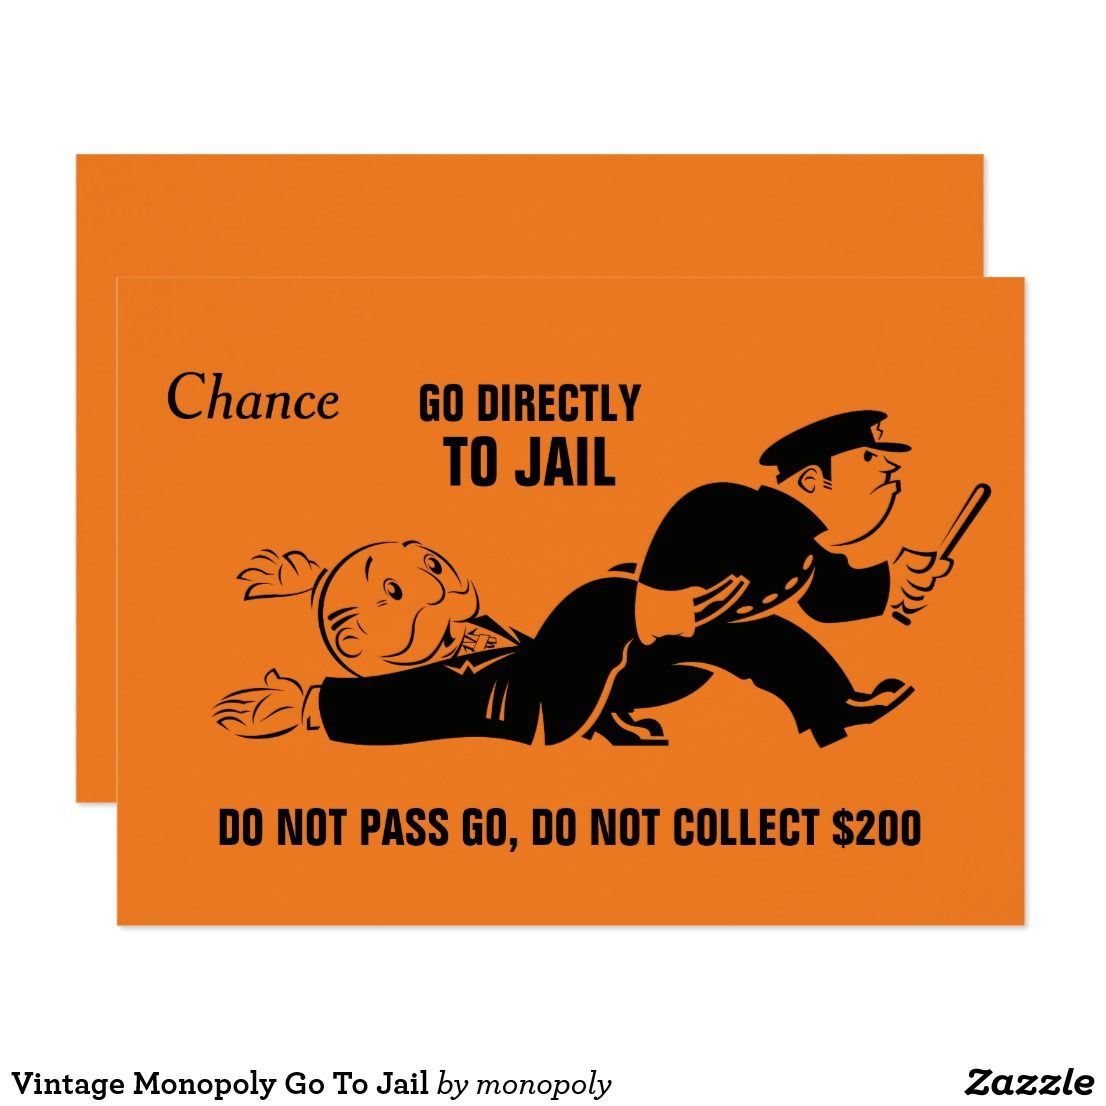 Vintage Monopoly Go To Jail Zazzle Com Monopoly Cards Custom Monopoly Monopoly Party